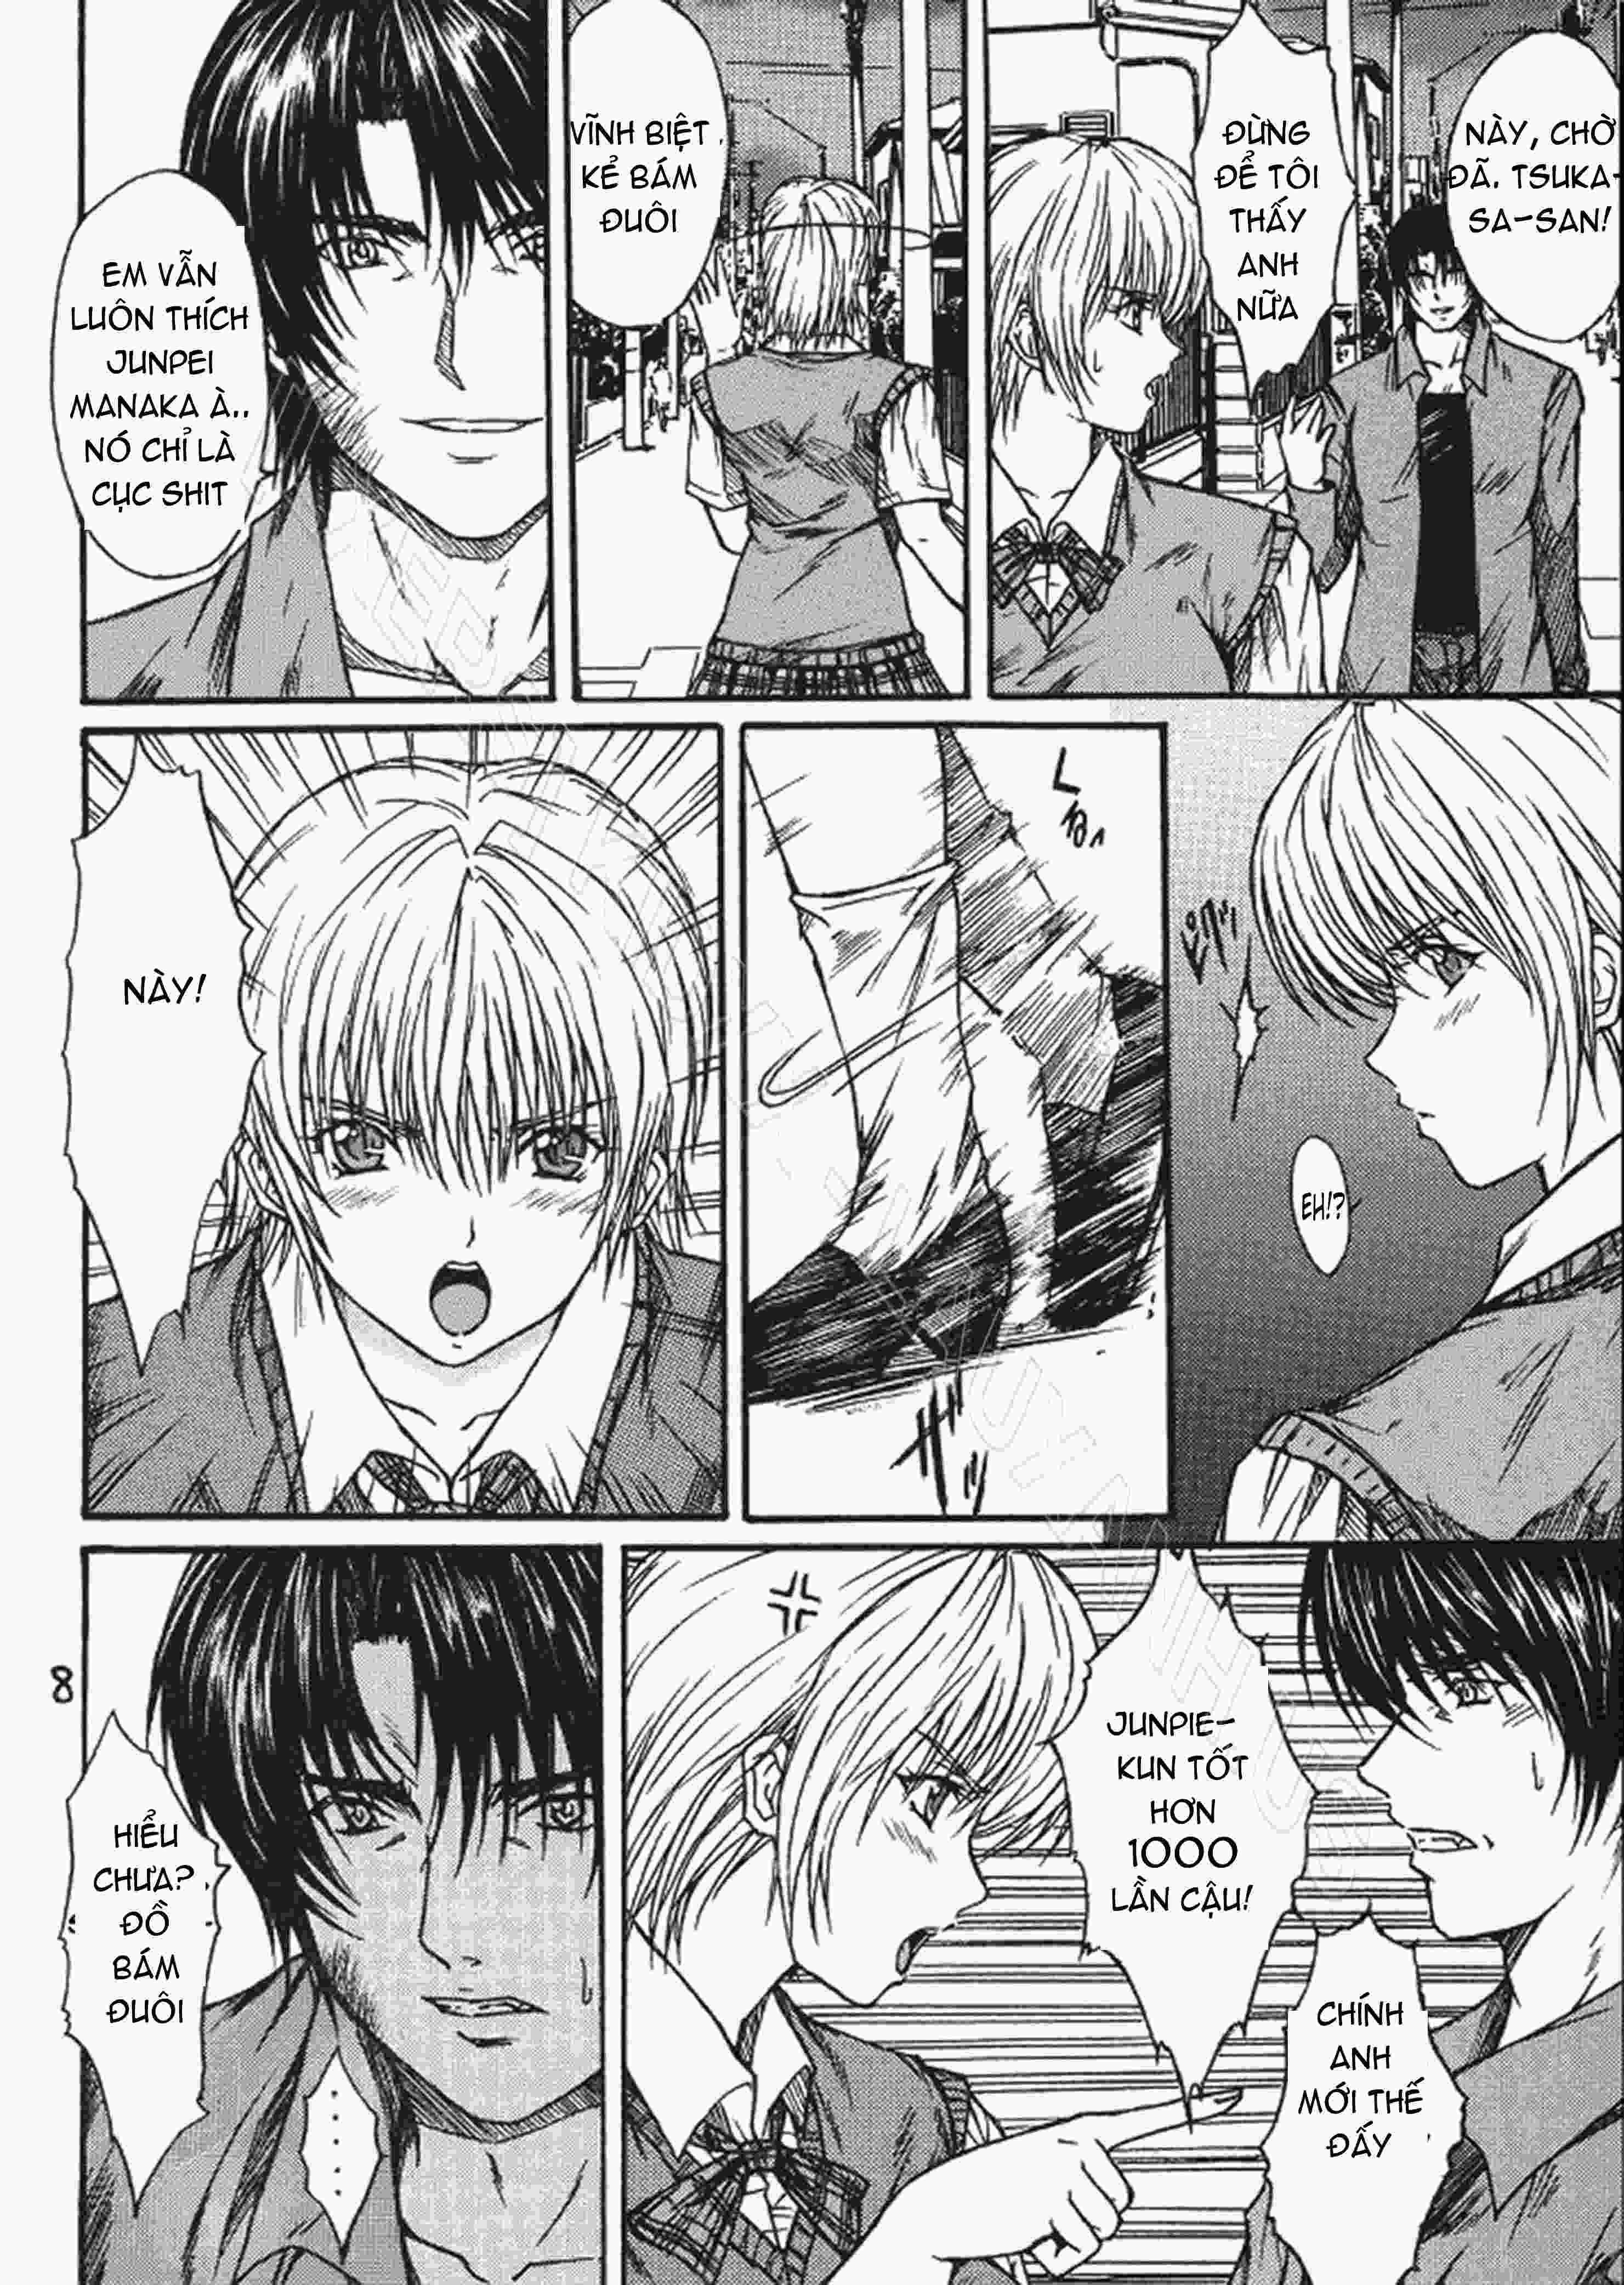 TruyenHay.Com - Ảnh 7 - Ryoujoku Rensa Chapter 3